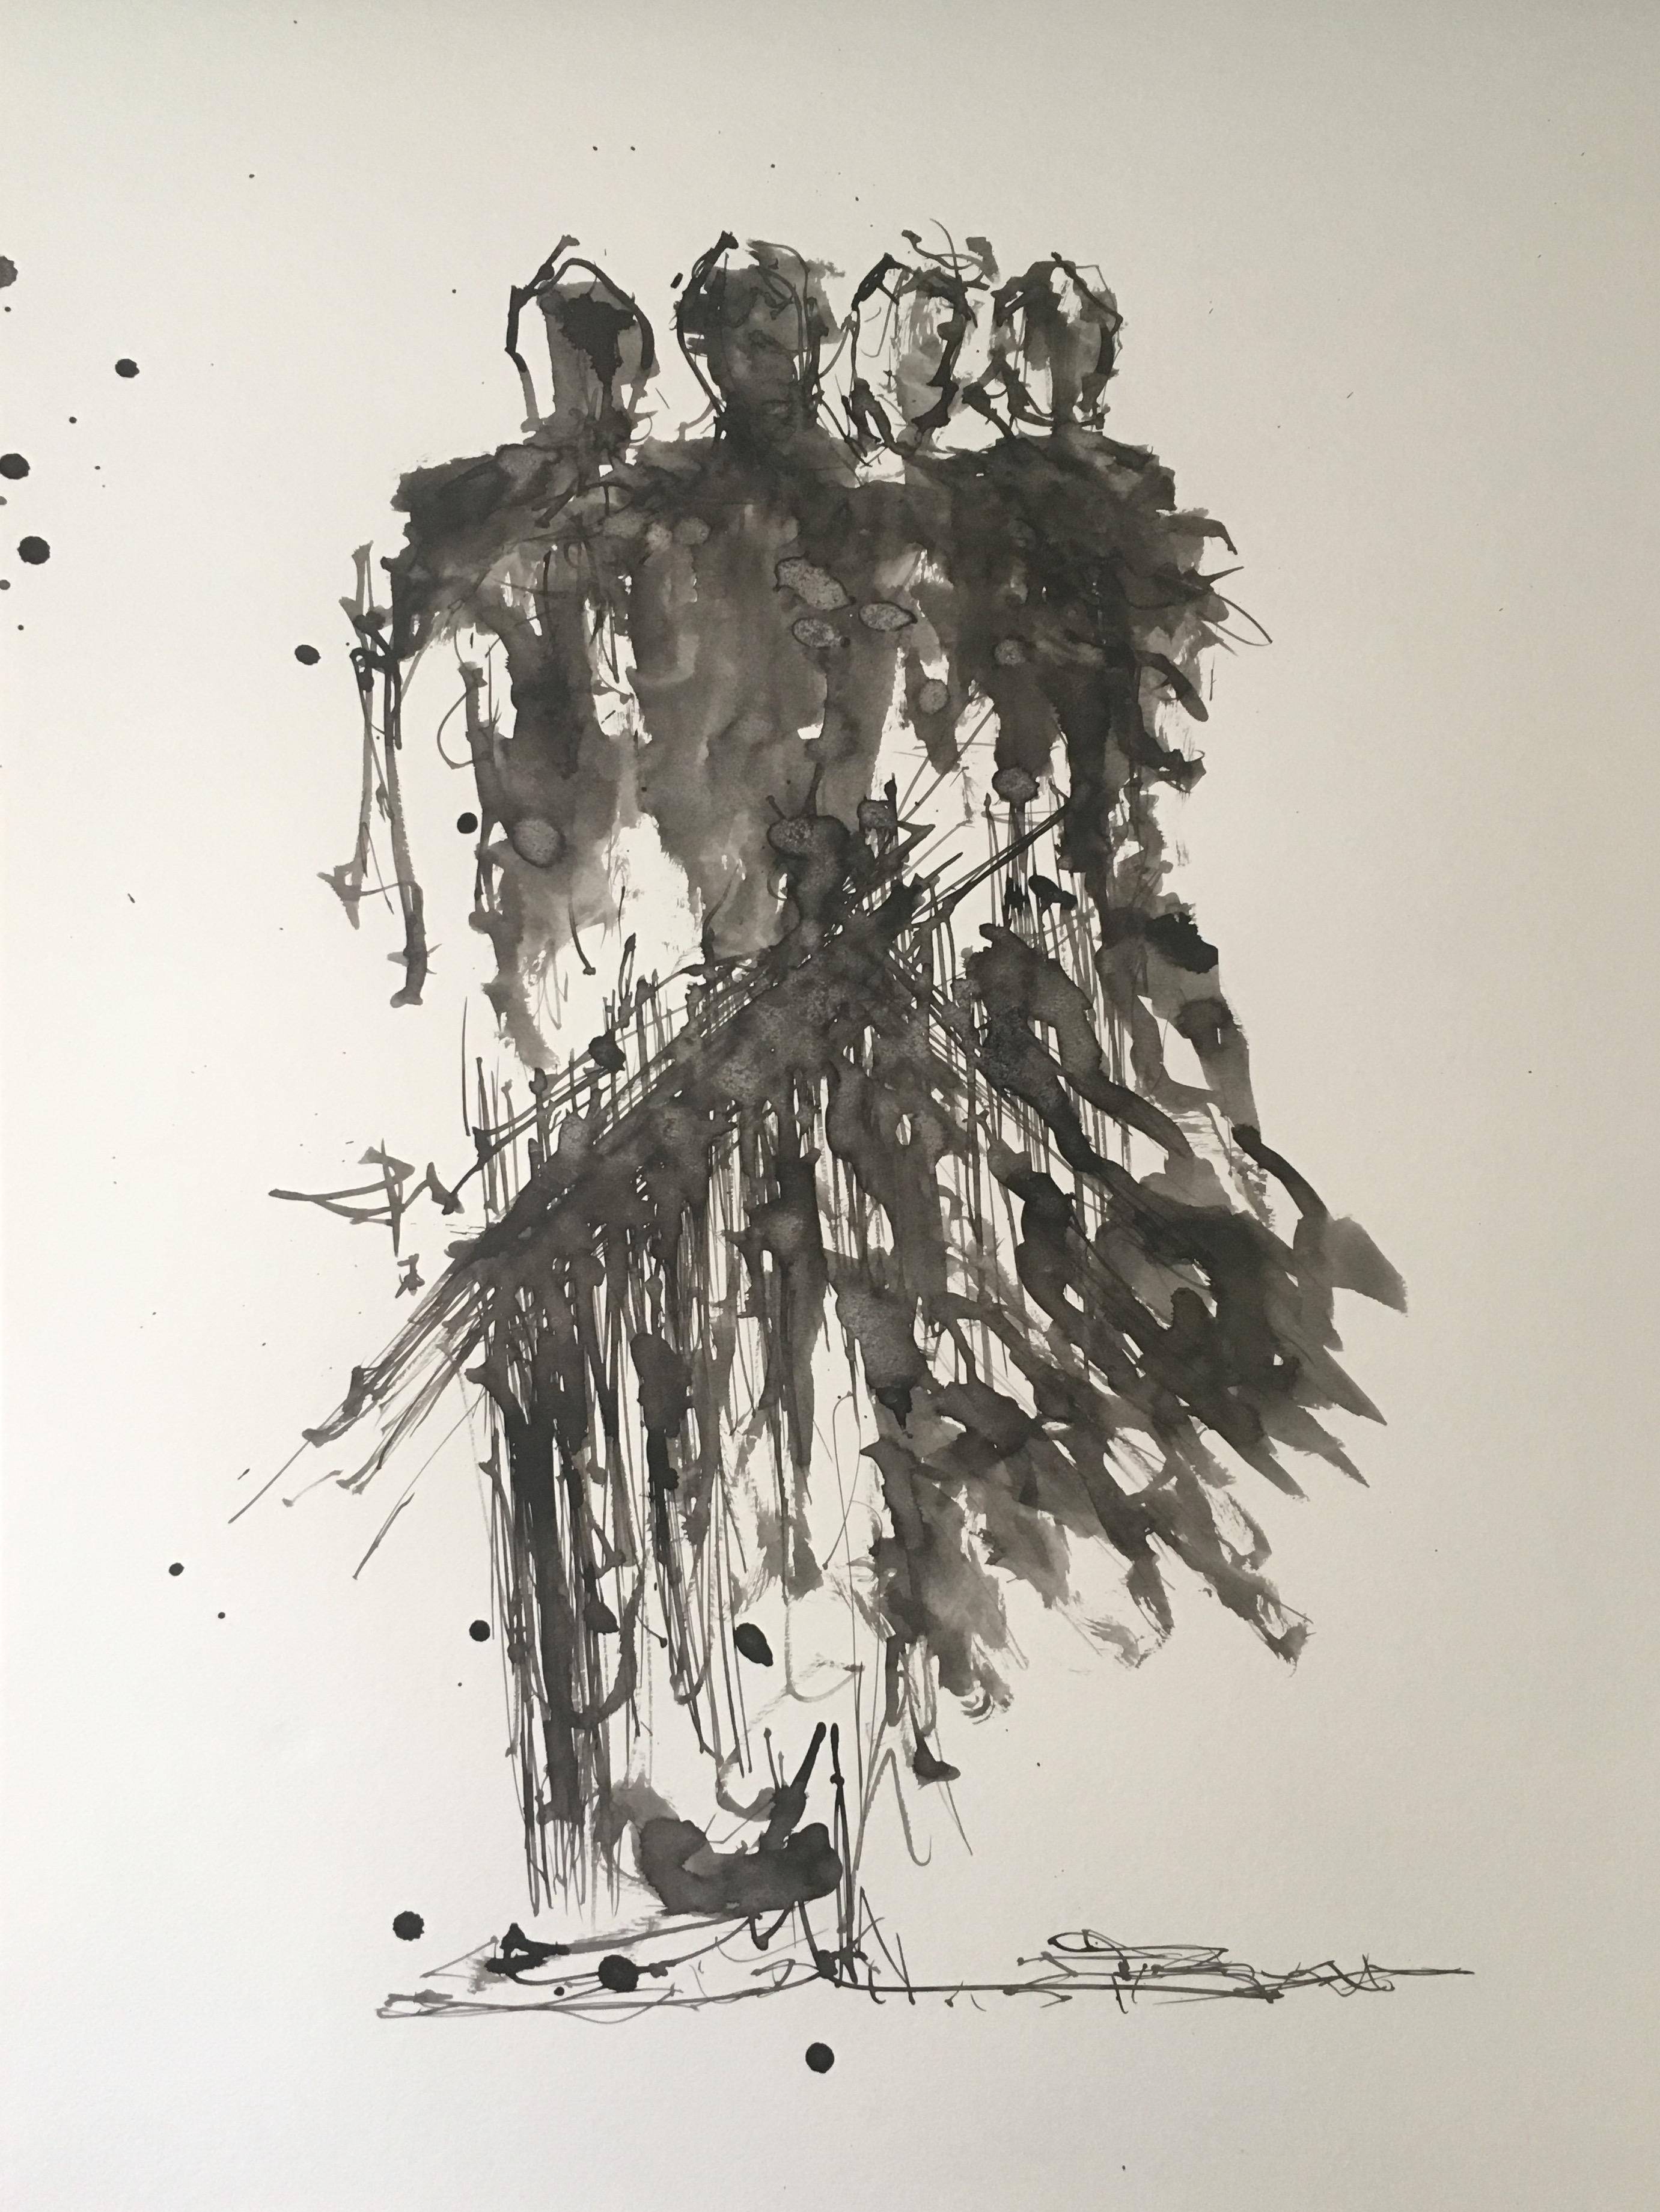 Untitled 5 - Farzad Kohan